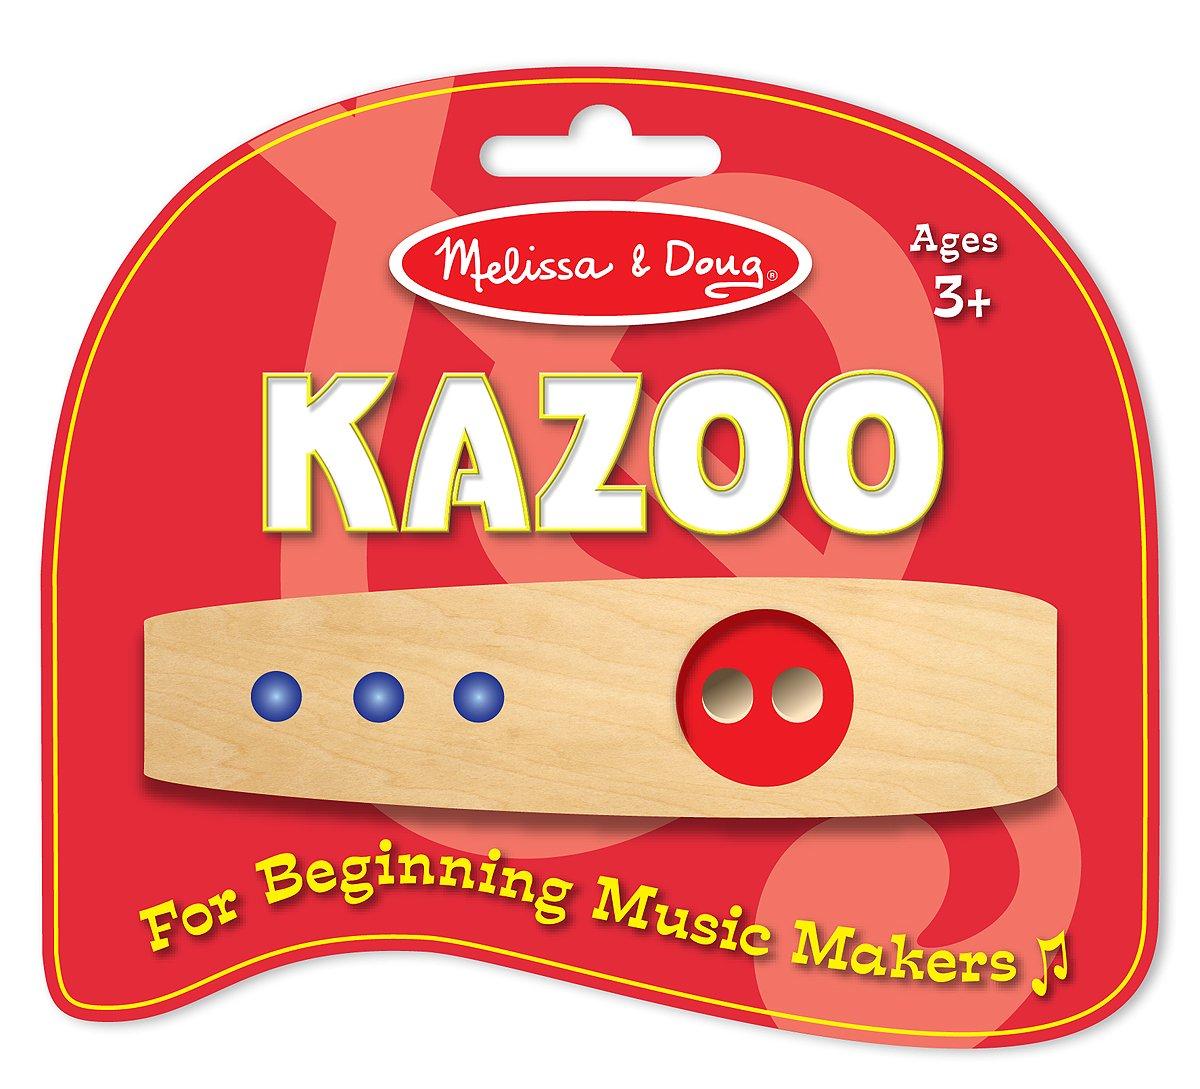 Melissa & Doug 1300 Making Music Beginner Wooden Kazoo Melissa and Doug